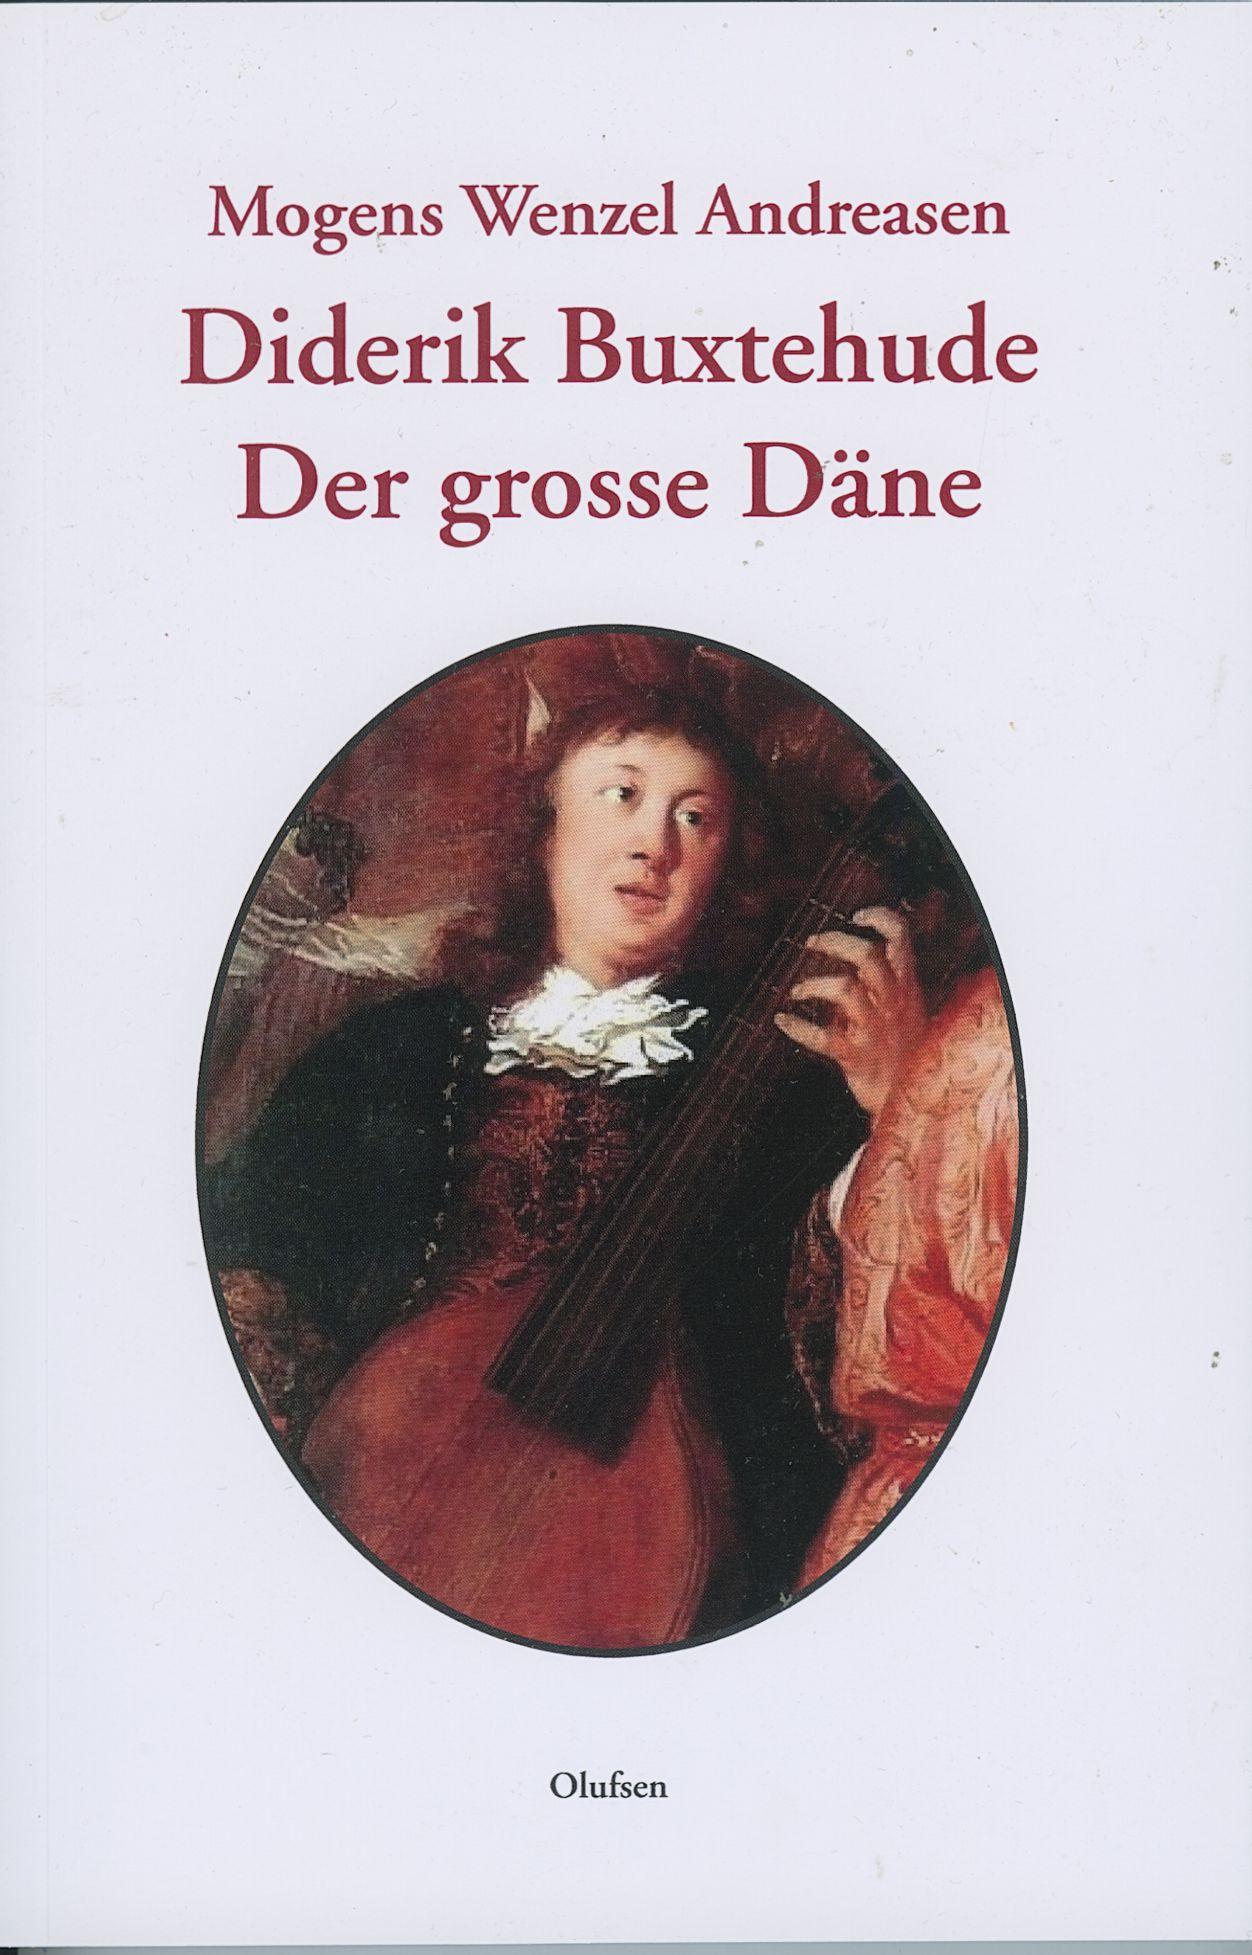 Diderik Buxtehude - Mogens Wenzel Andreasen - Bøger - Olufsen - 9788793331617 - 7/8-2019